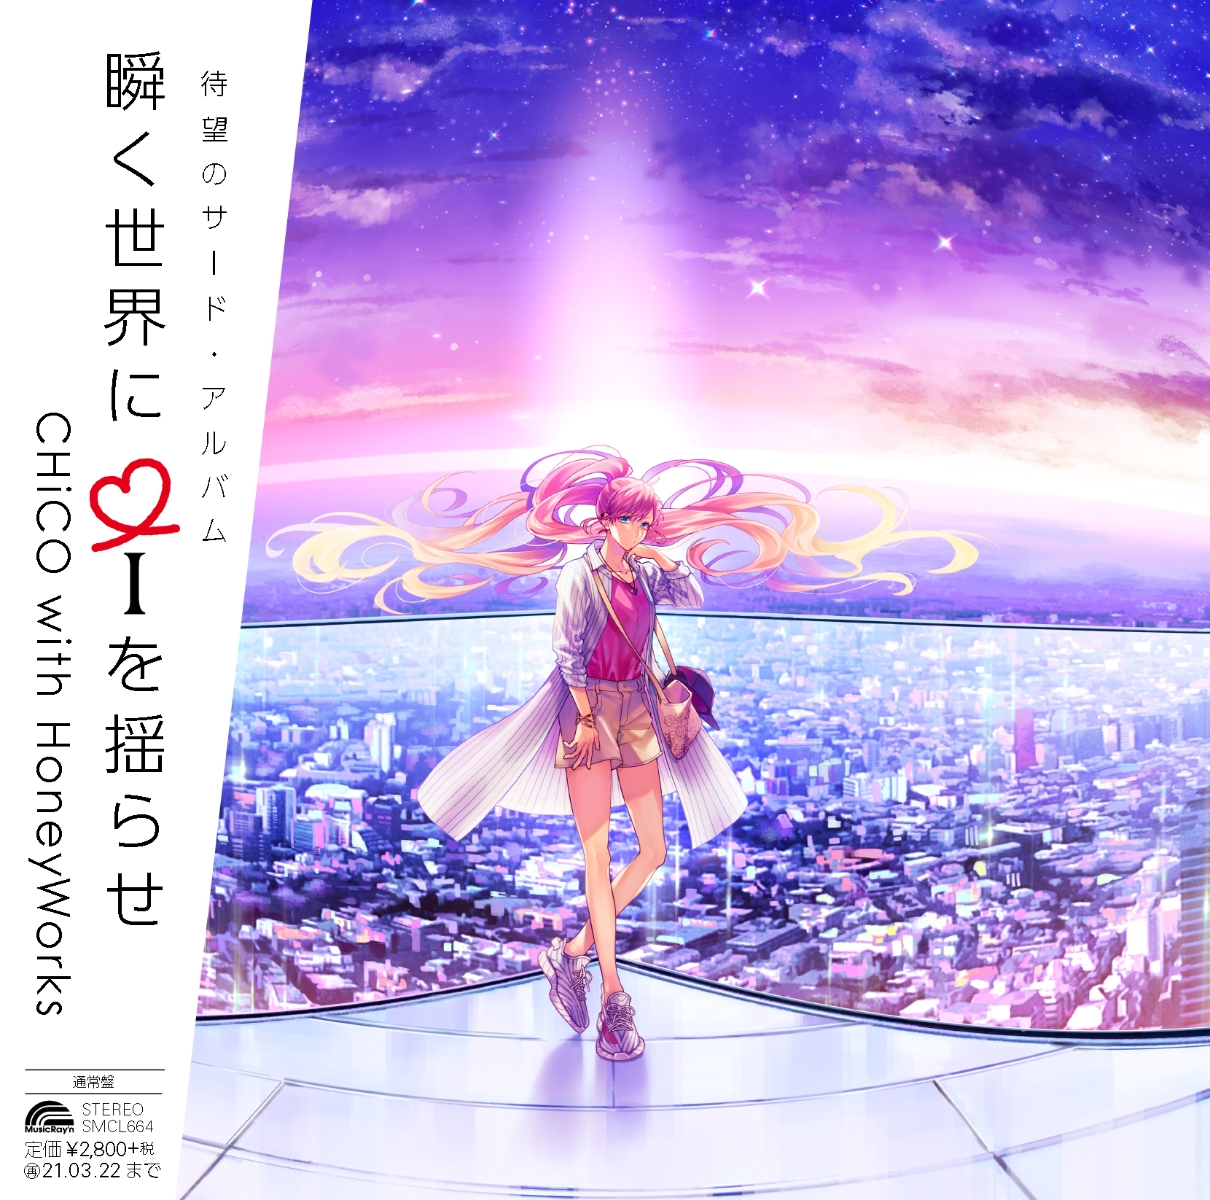 CHiCO with HoneyWorks - Matataku Sekai ni i wo Yurase / 瞬く世界に i を揺らせ